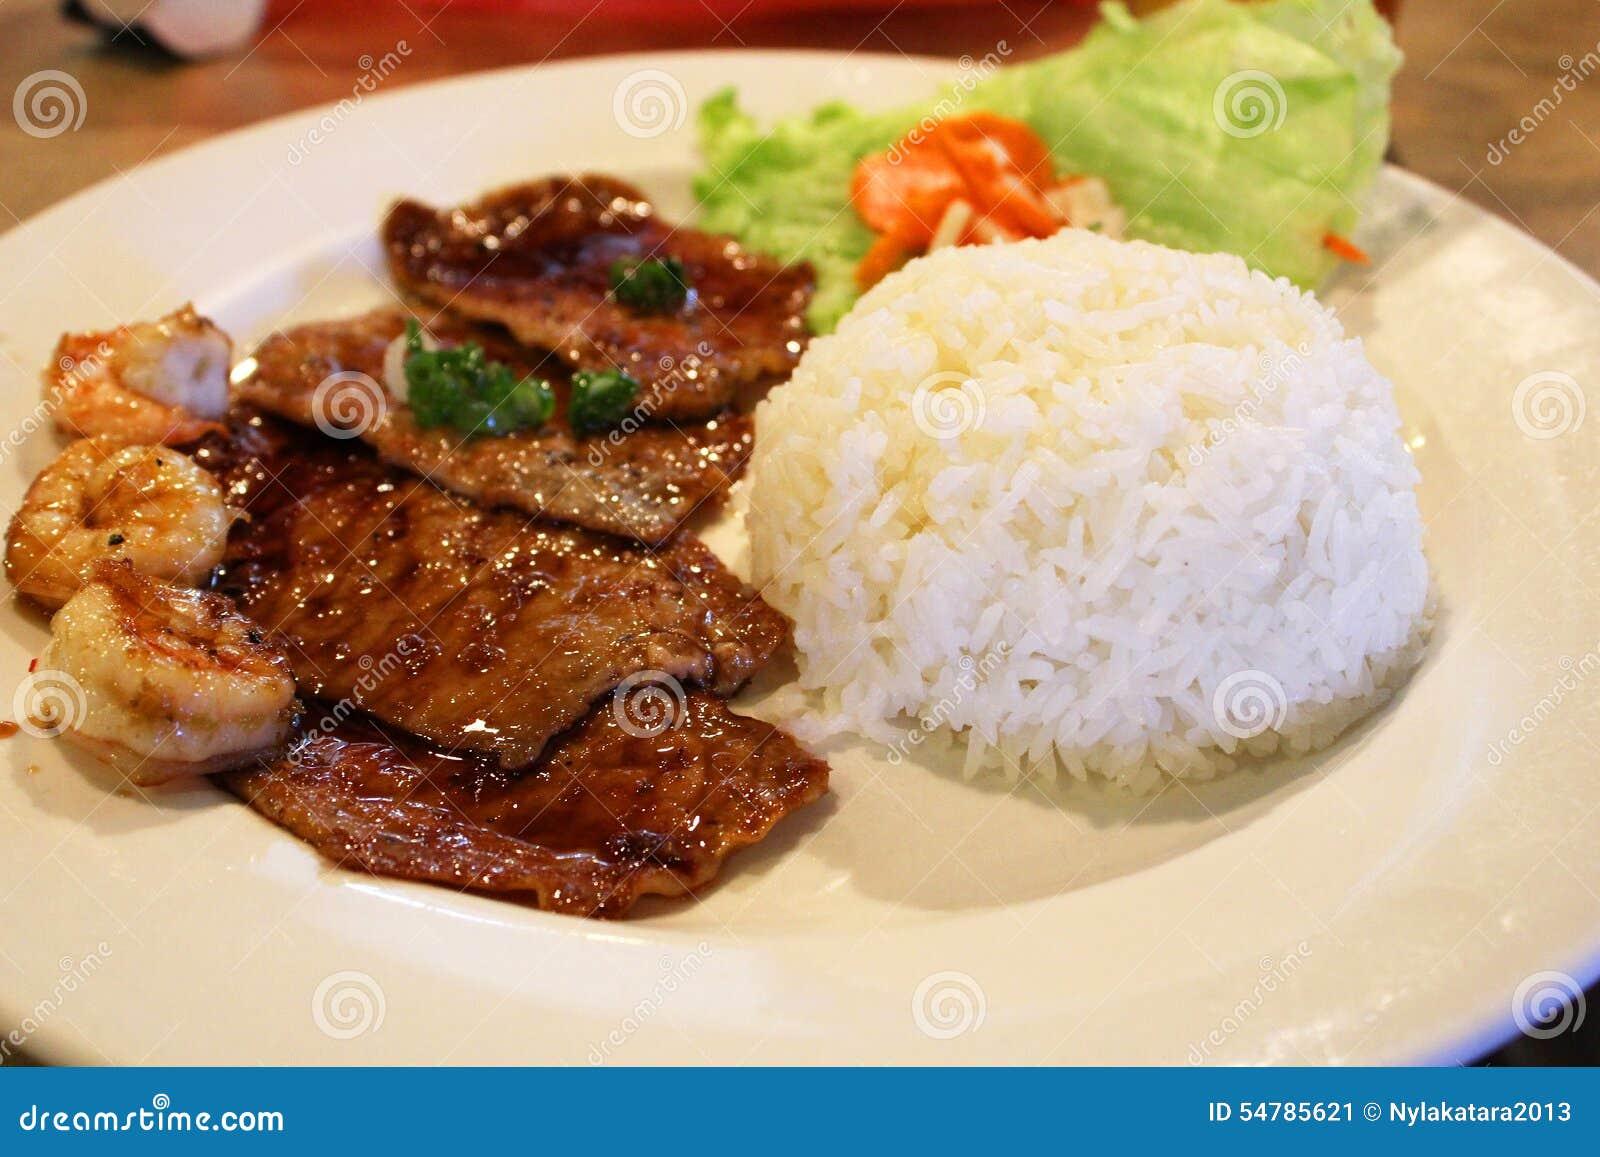 Cuisine vietnamienne photo stock image 54785621 - Zen la cuisine vietnamienne ...